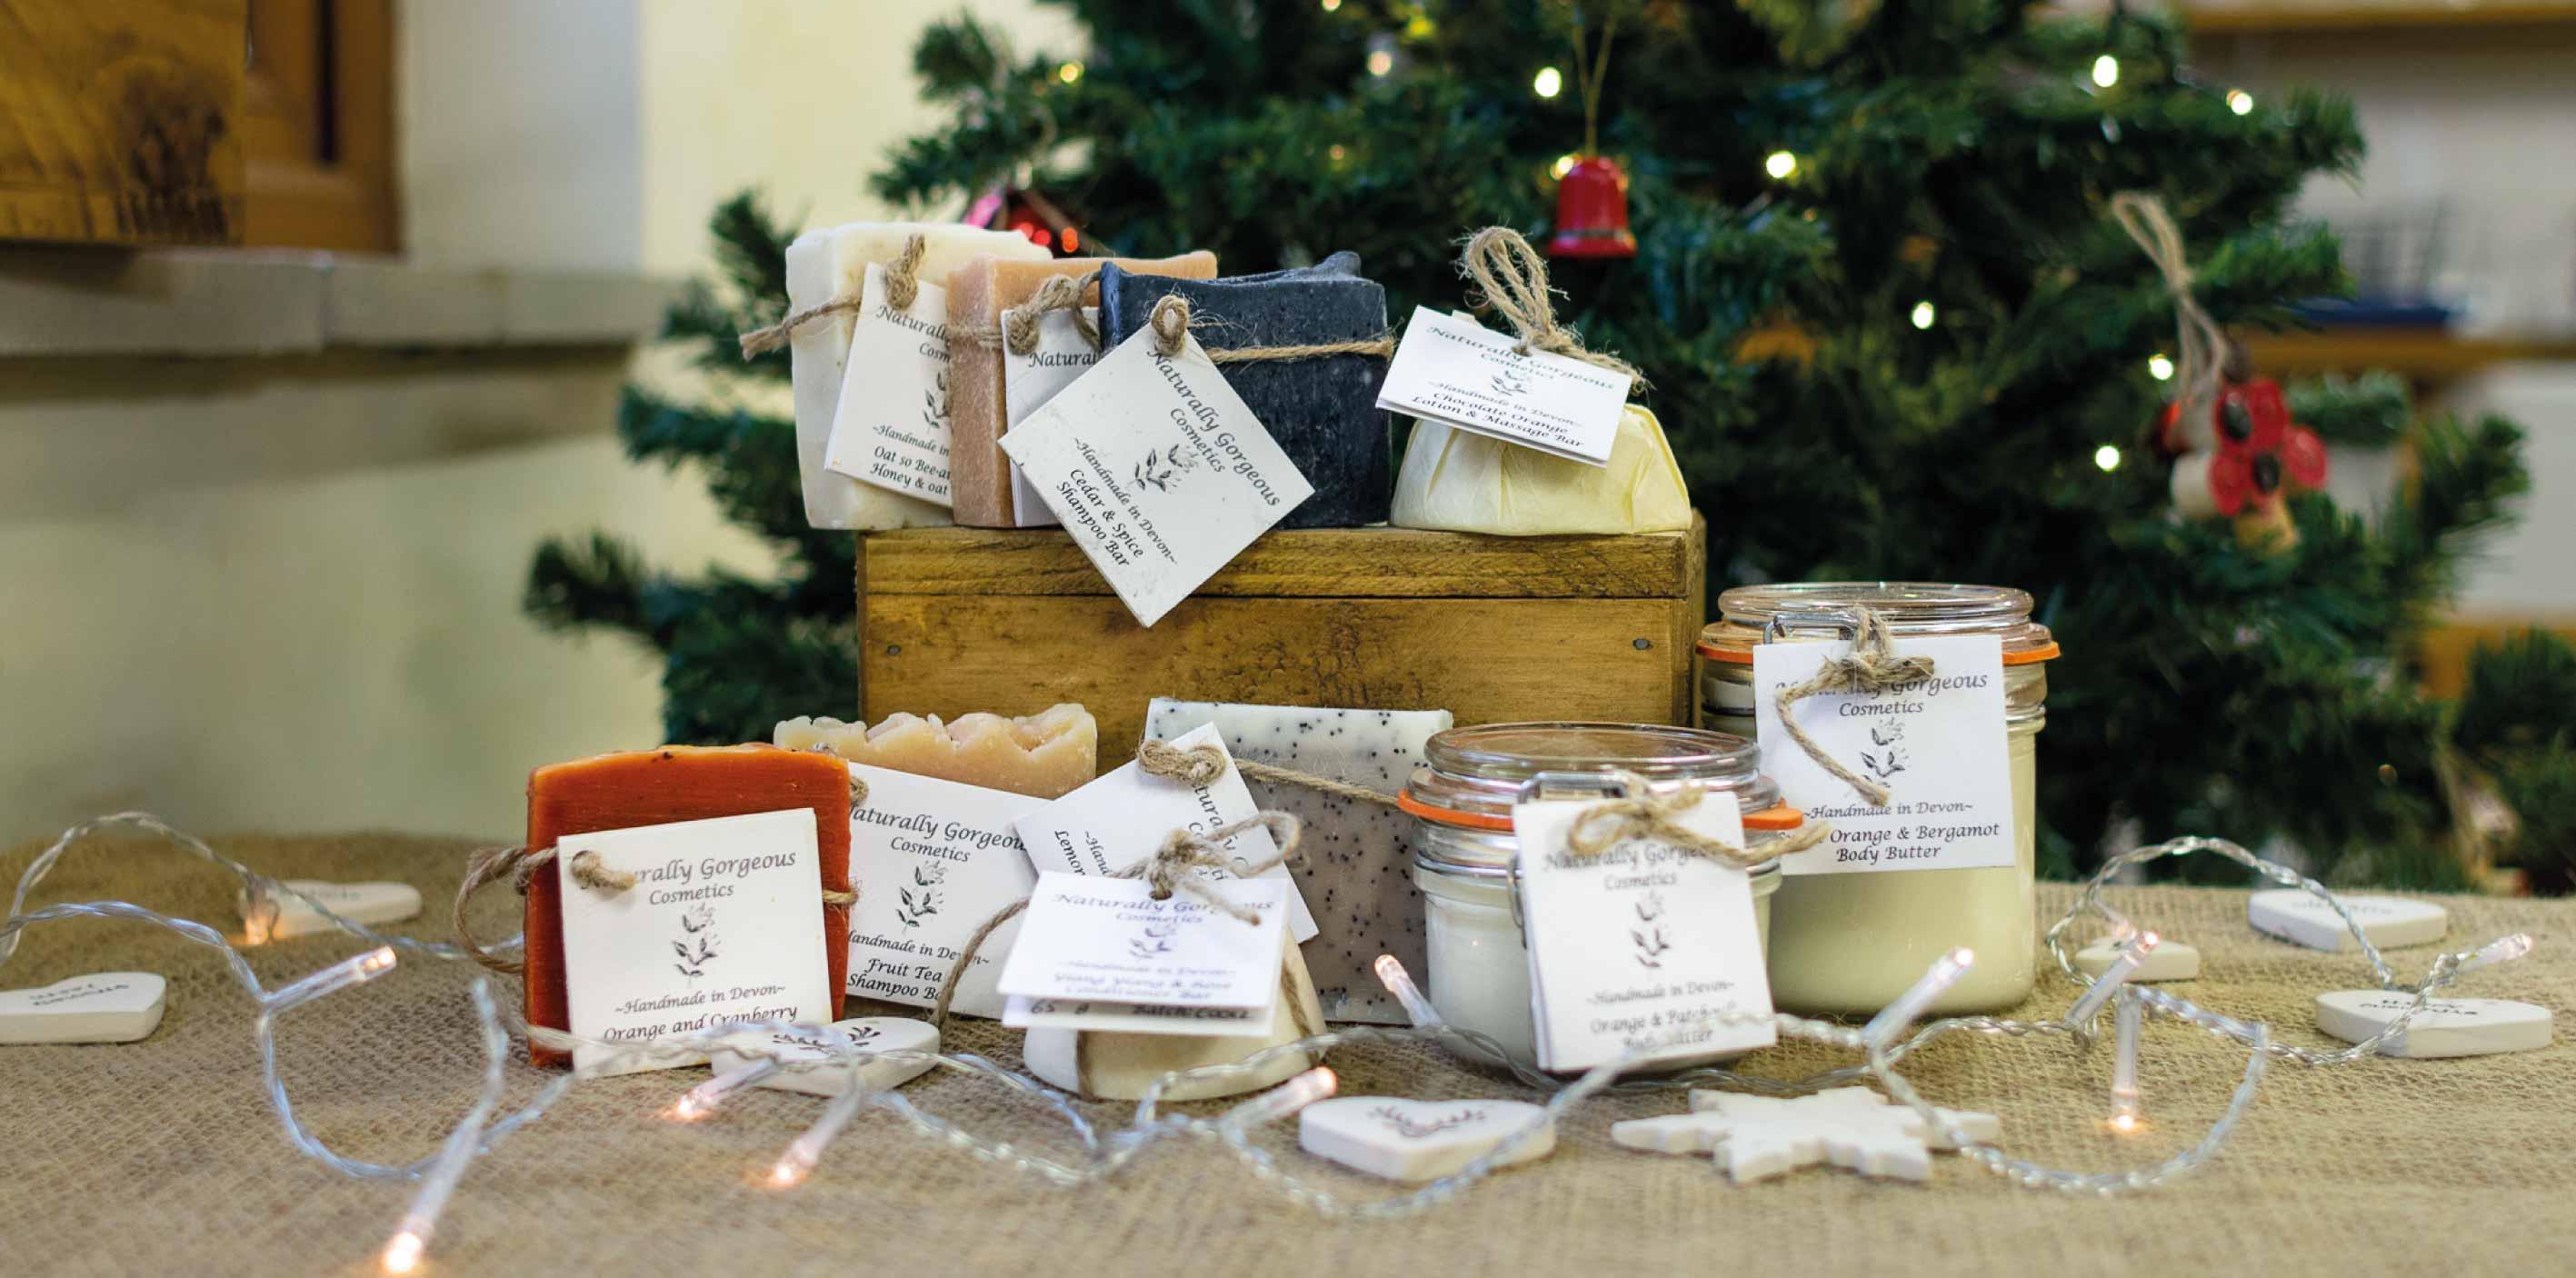 Buy local cosmetics this Christmas at Alder Vineyard